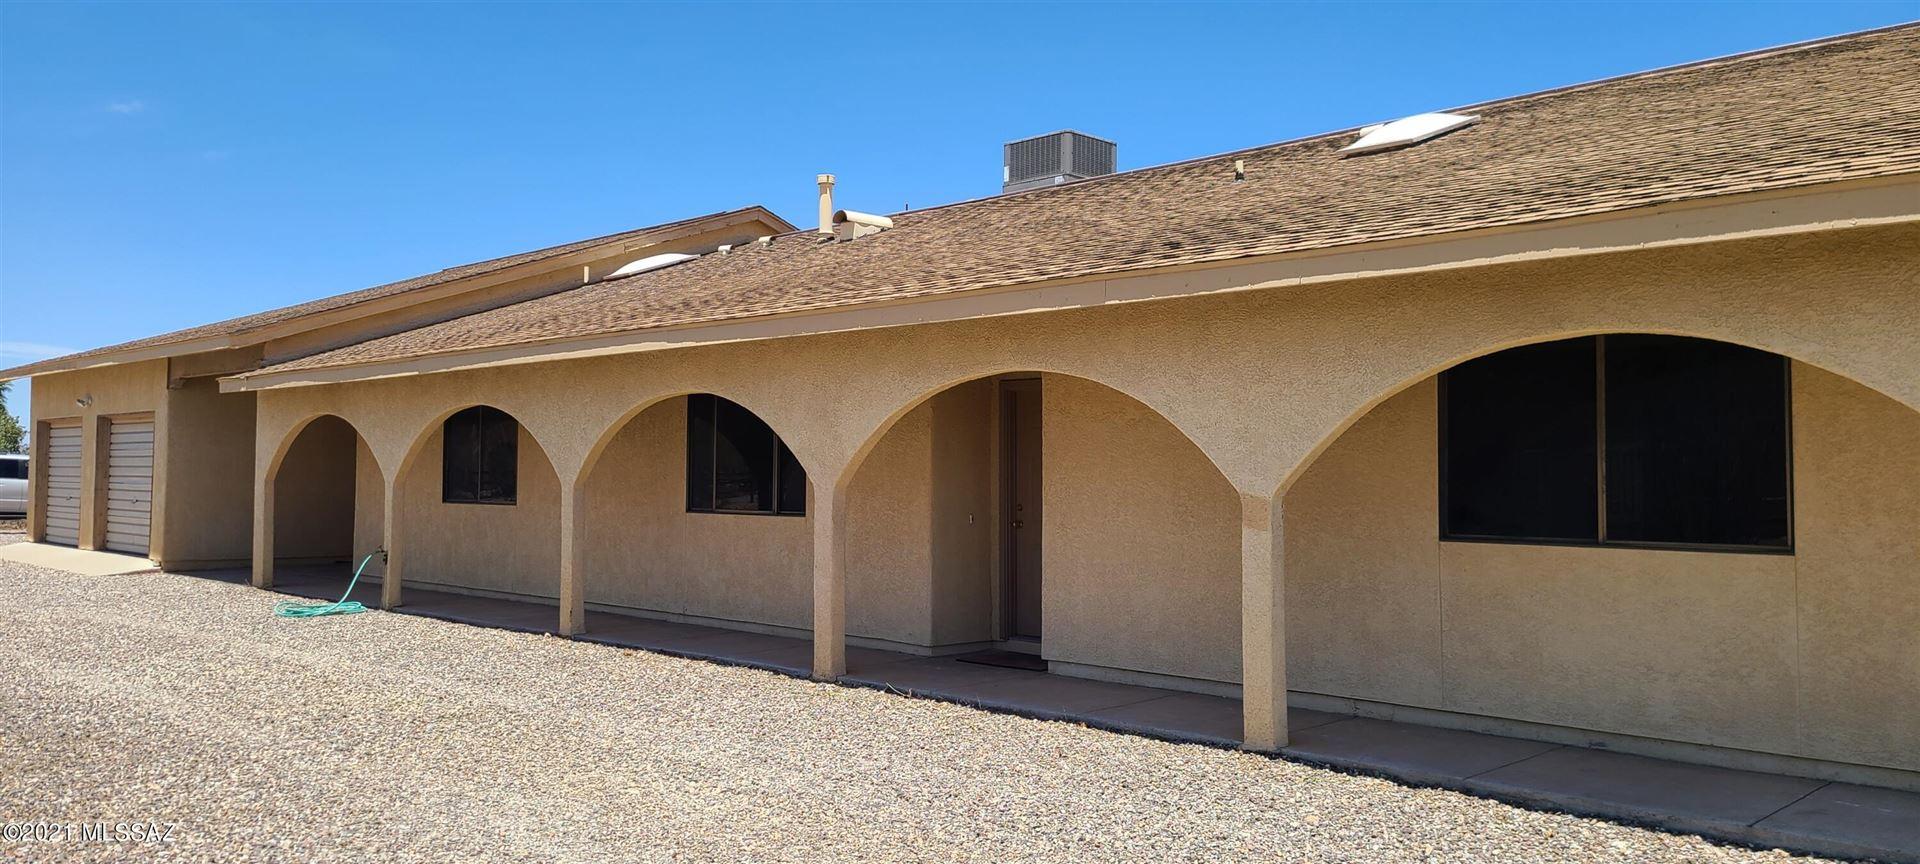 4550 N Camino De Oeste, Tucson, AZ 85745 - MLS#: 22113376